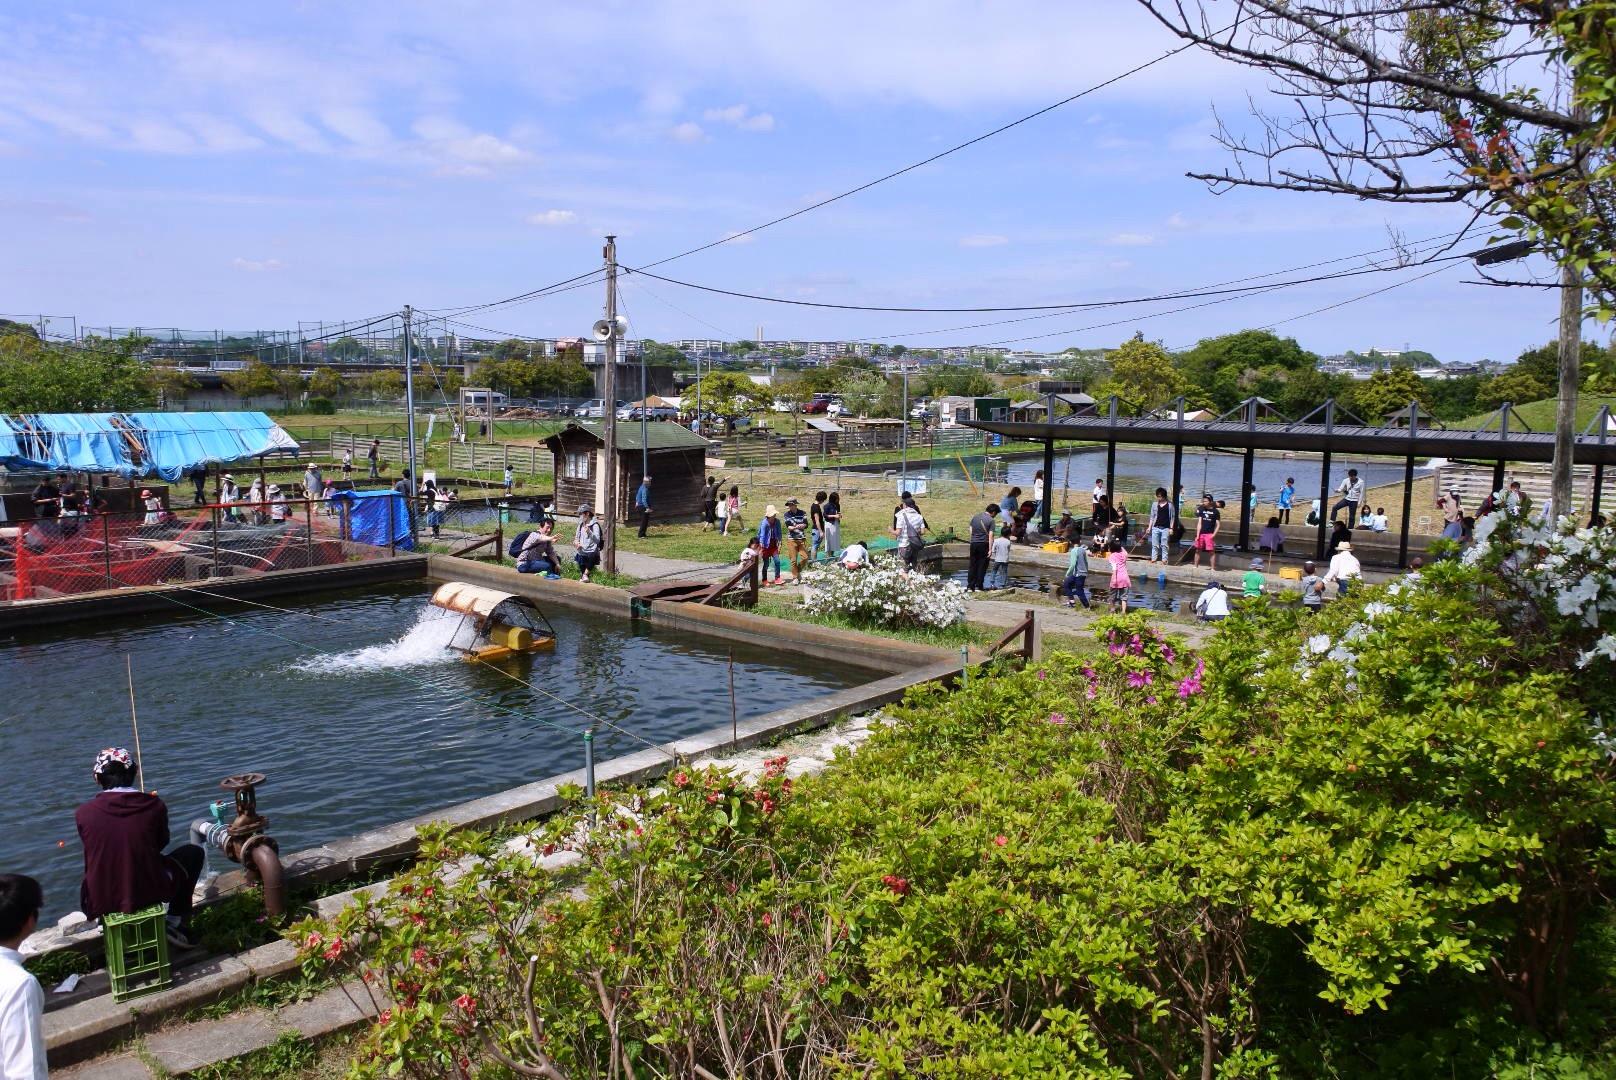 http://ud.t.u-tokyo.ac.jp/news/_images/IMG_9920.JPG